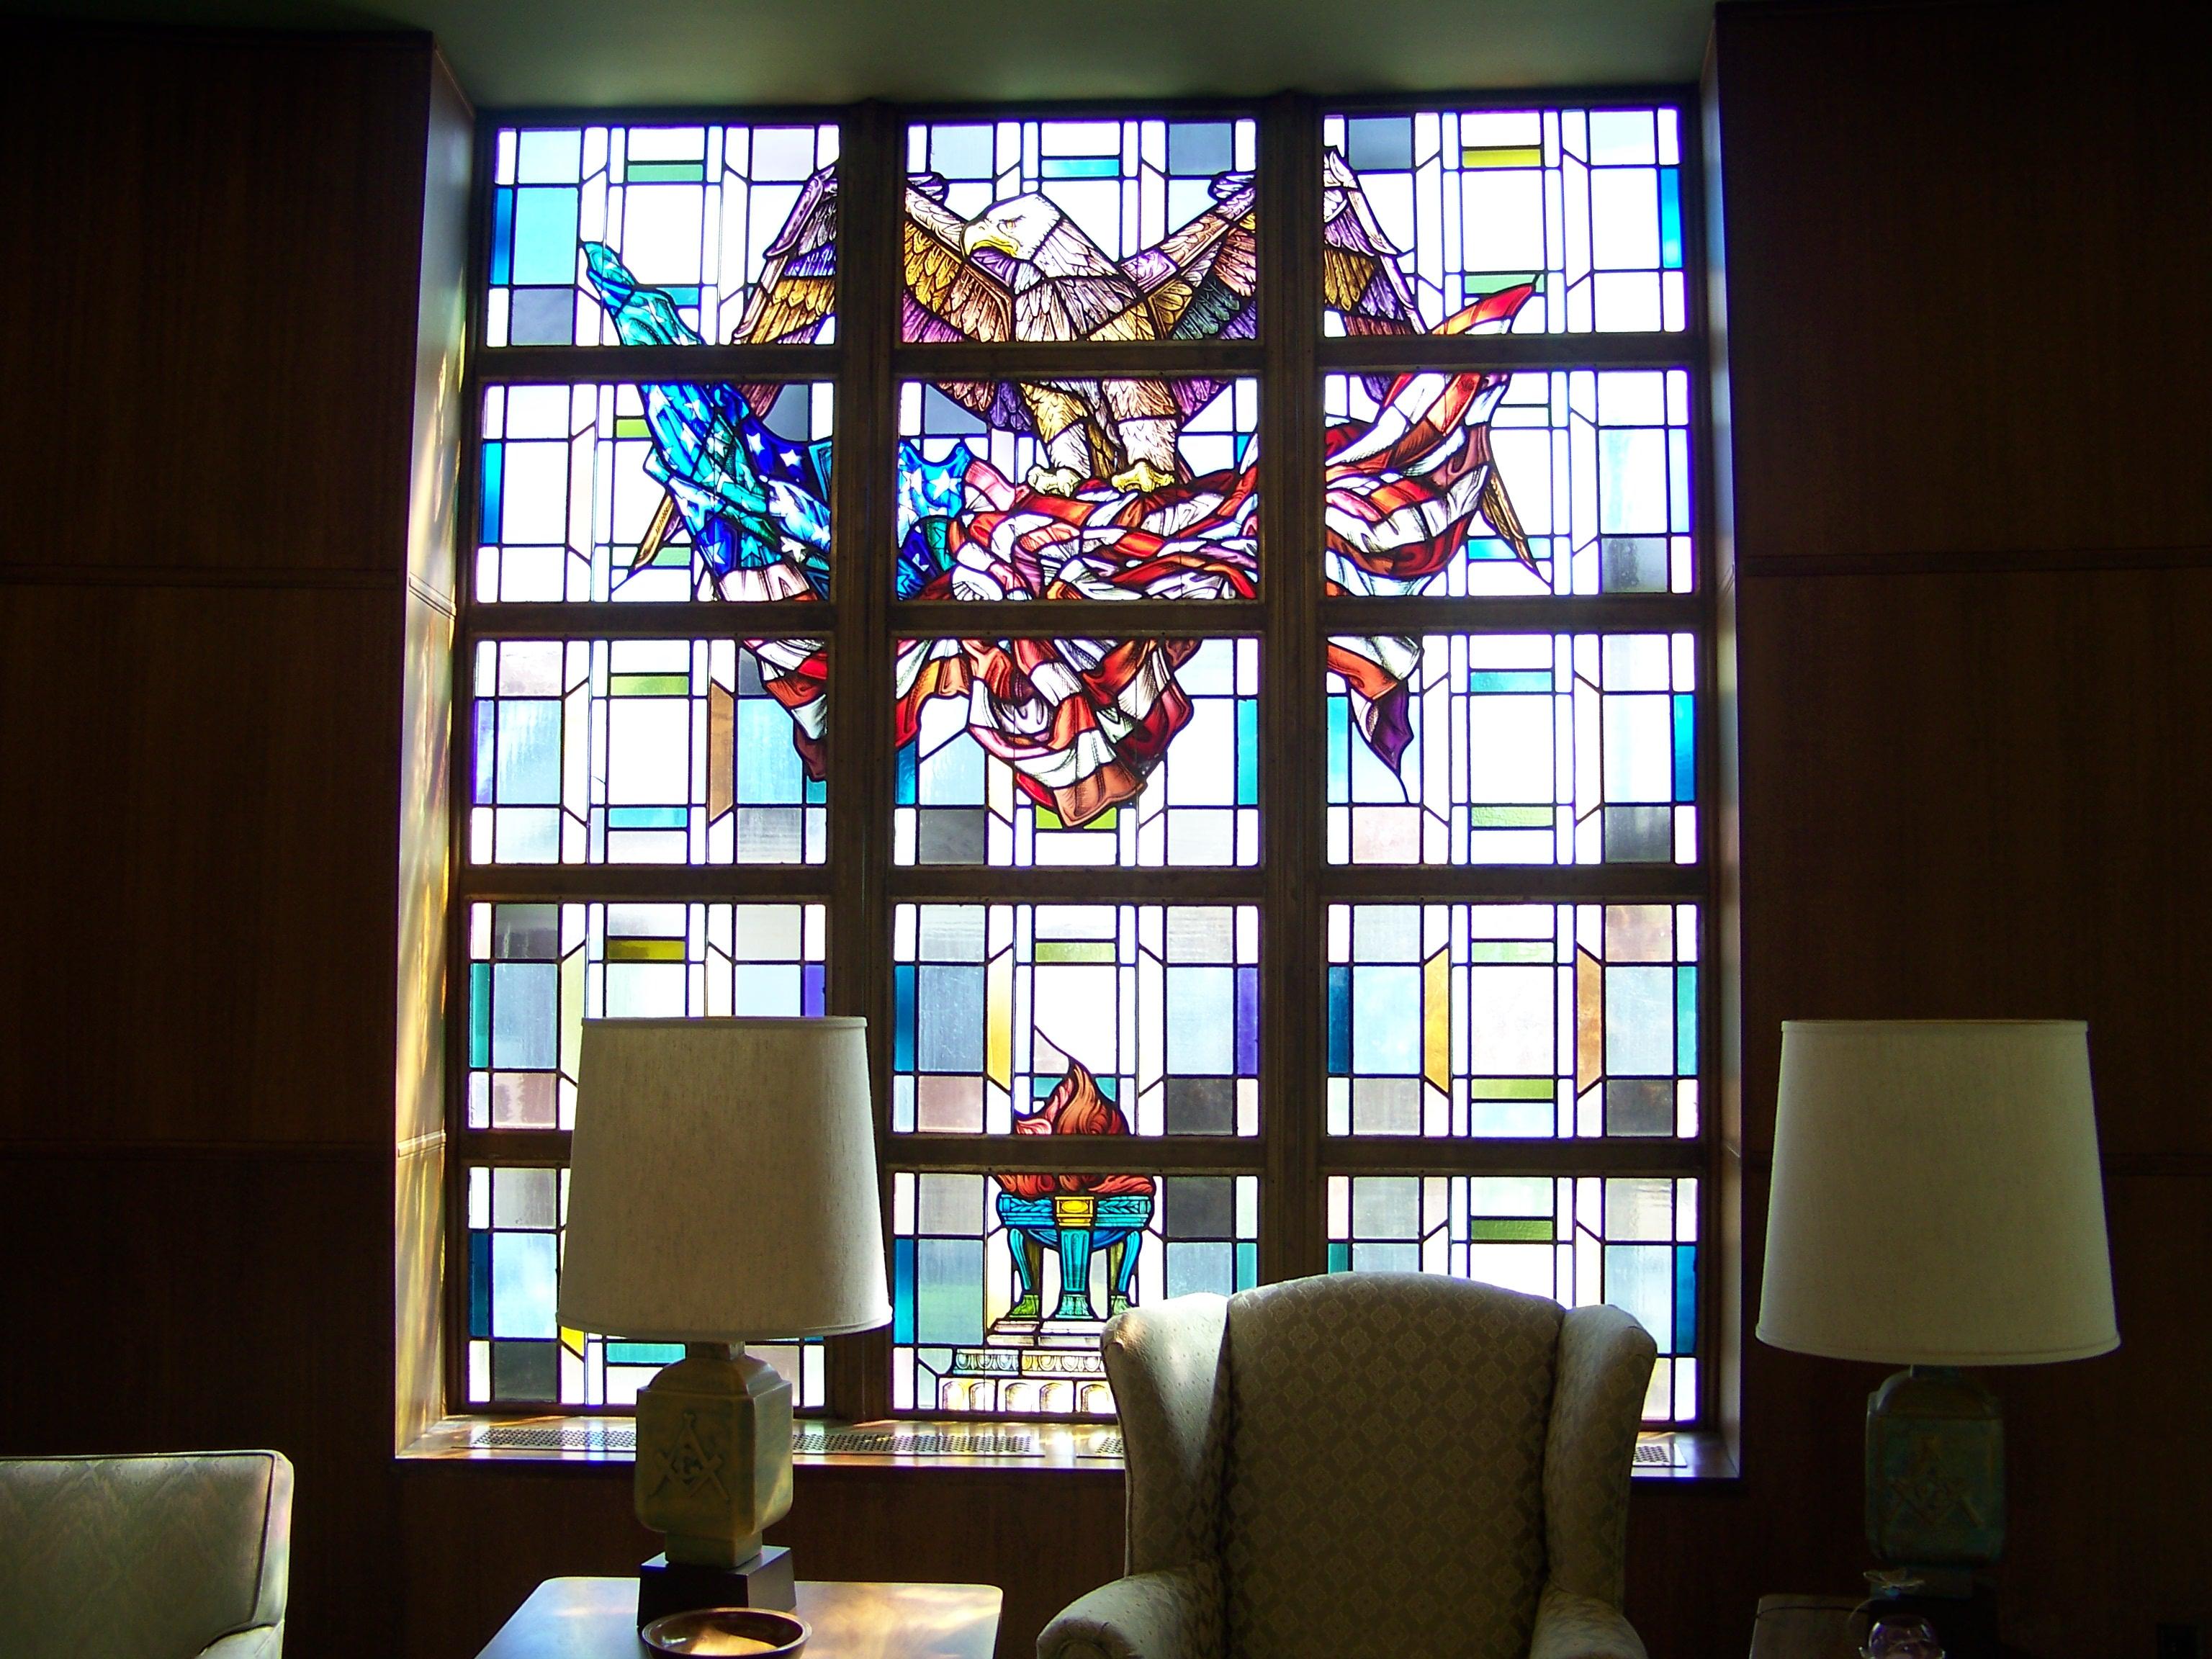 South center window War Memorial room